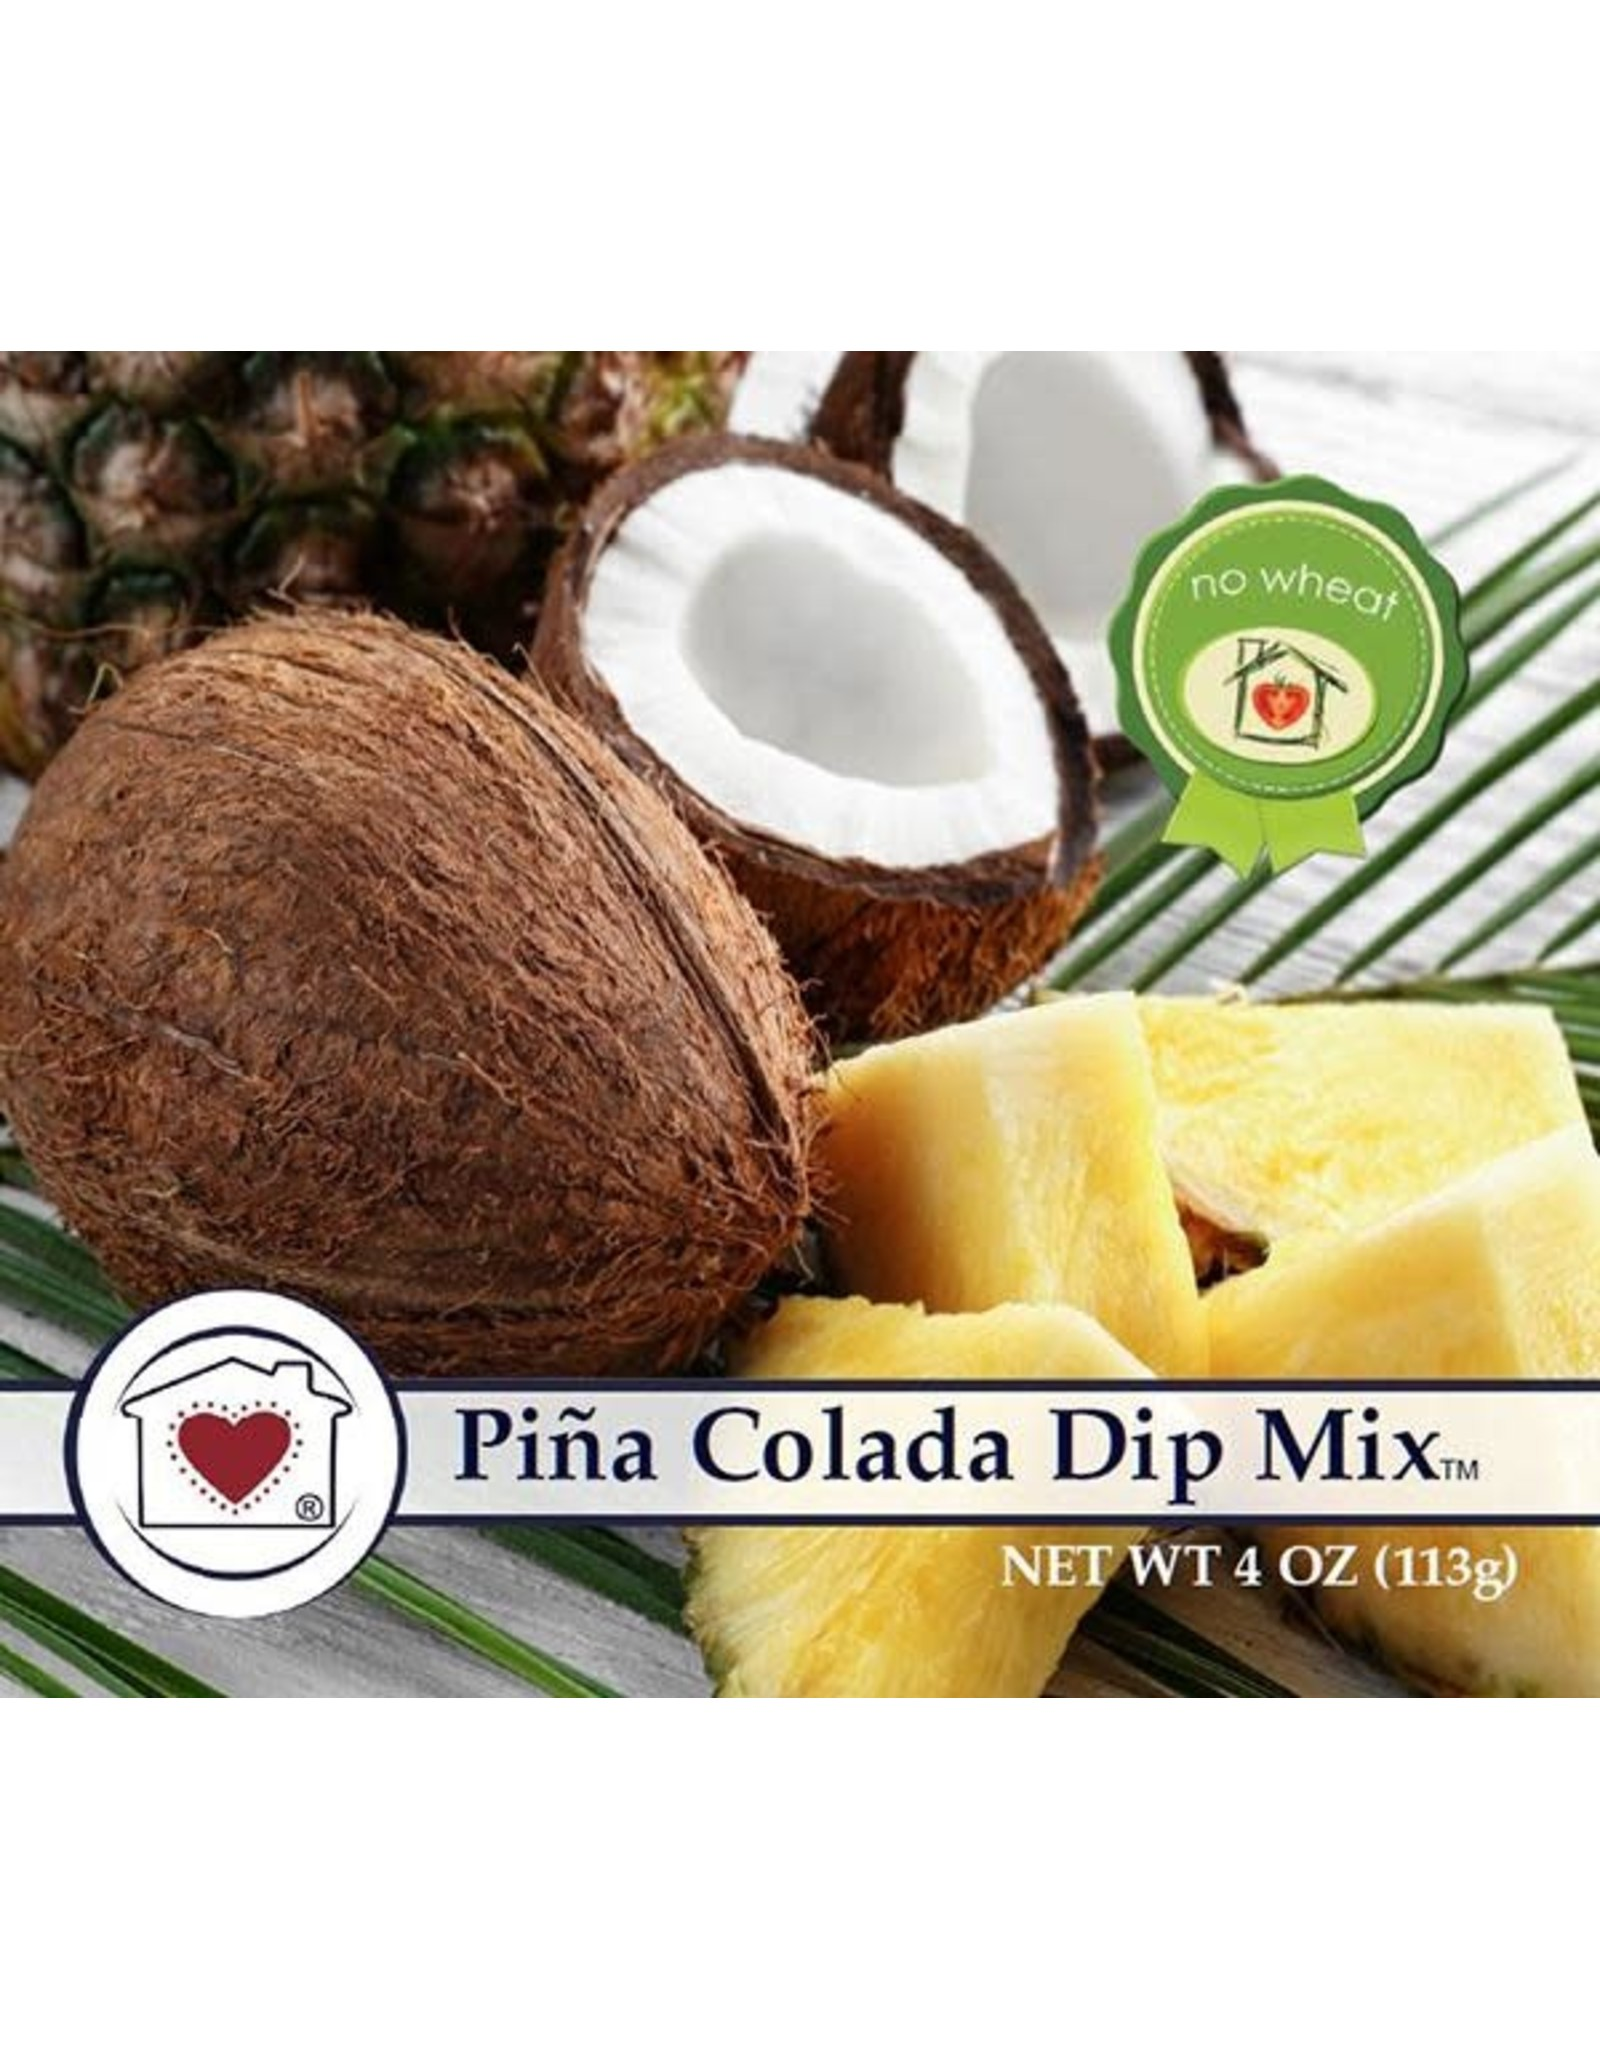 Country Home Creations PINA COLADA DIP MIX